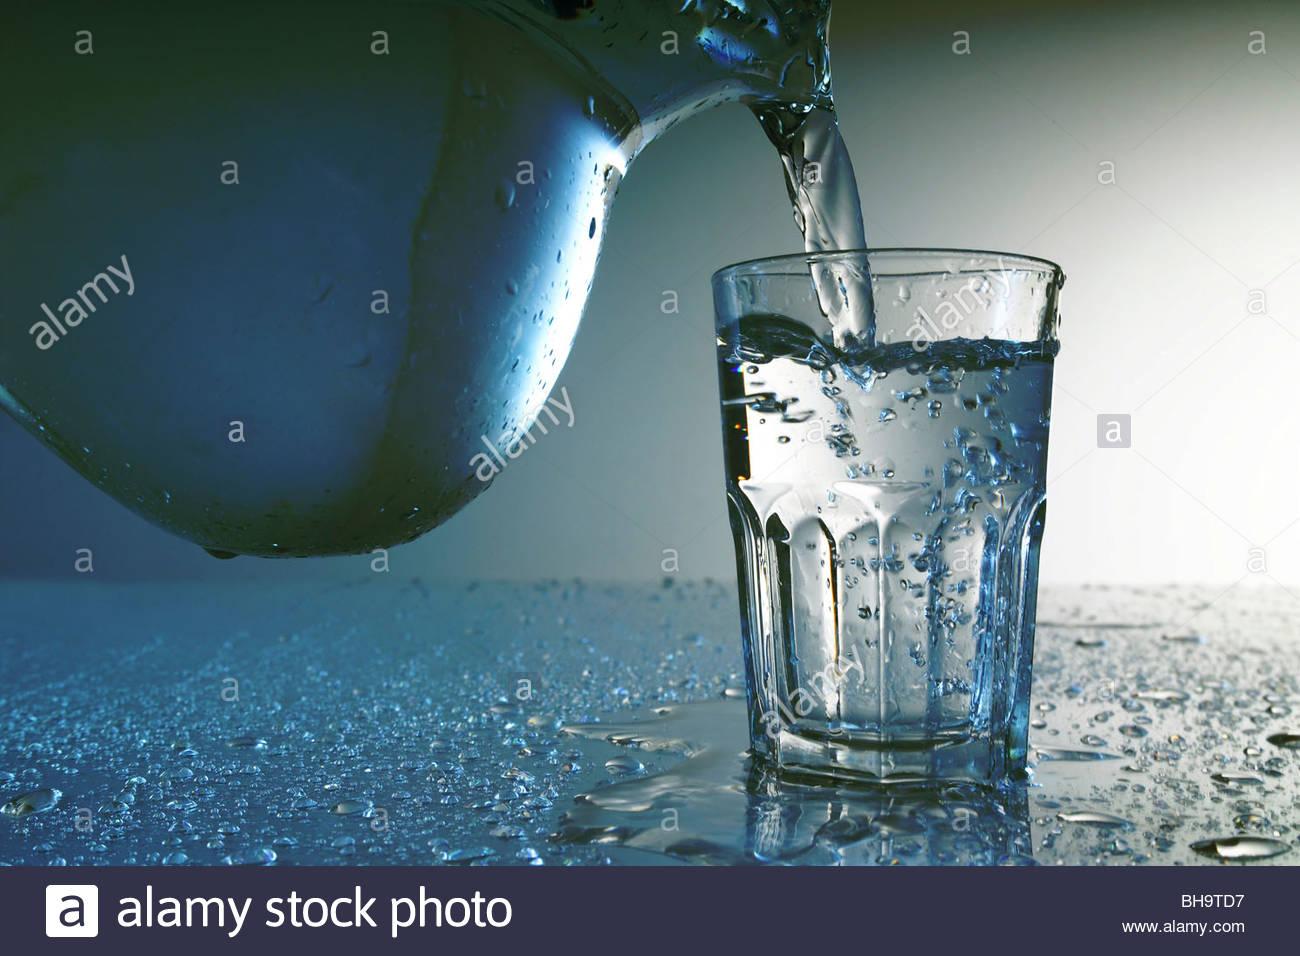 sauberes Wasser im Glas - Glass of clean Water Stock Photo